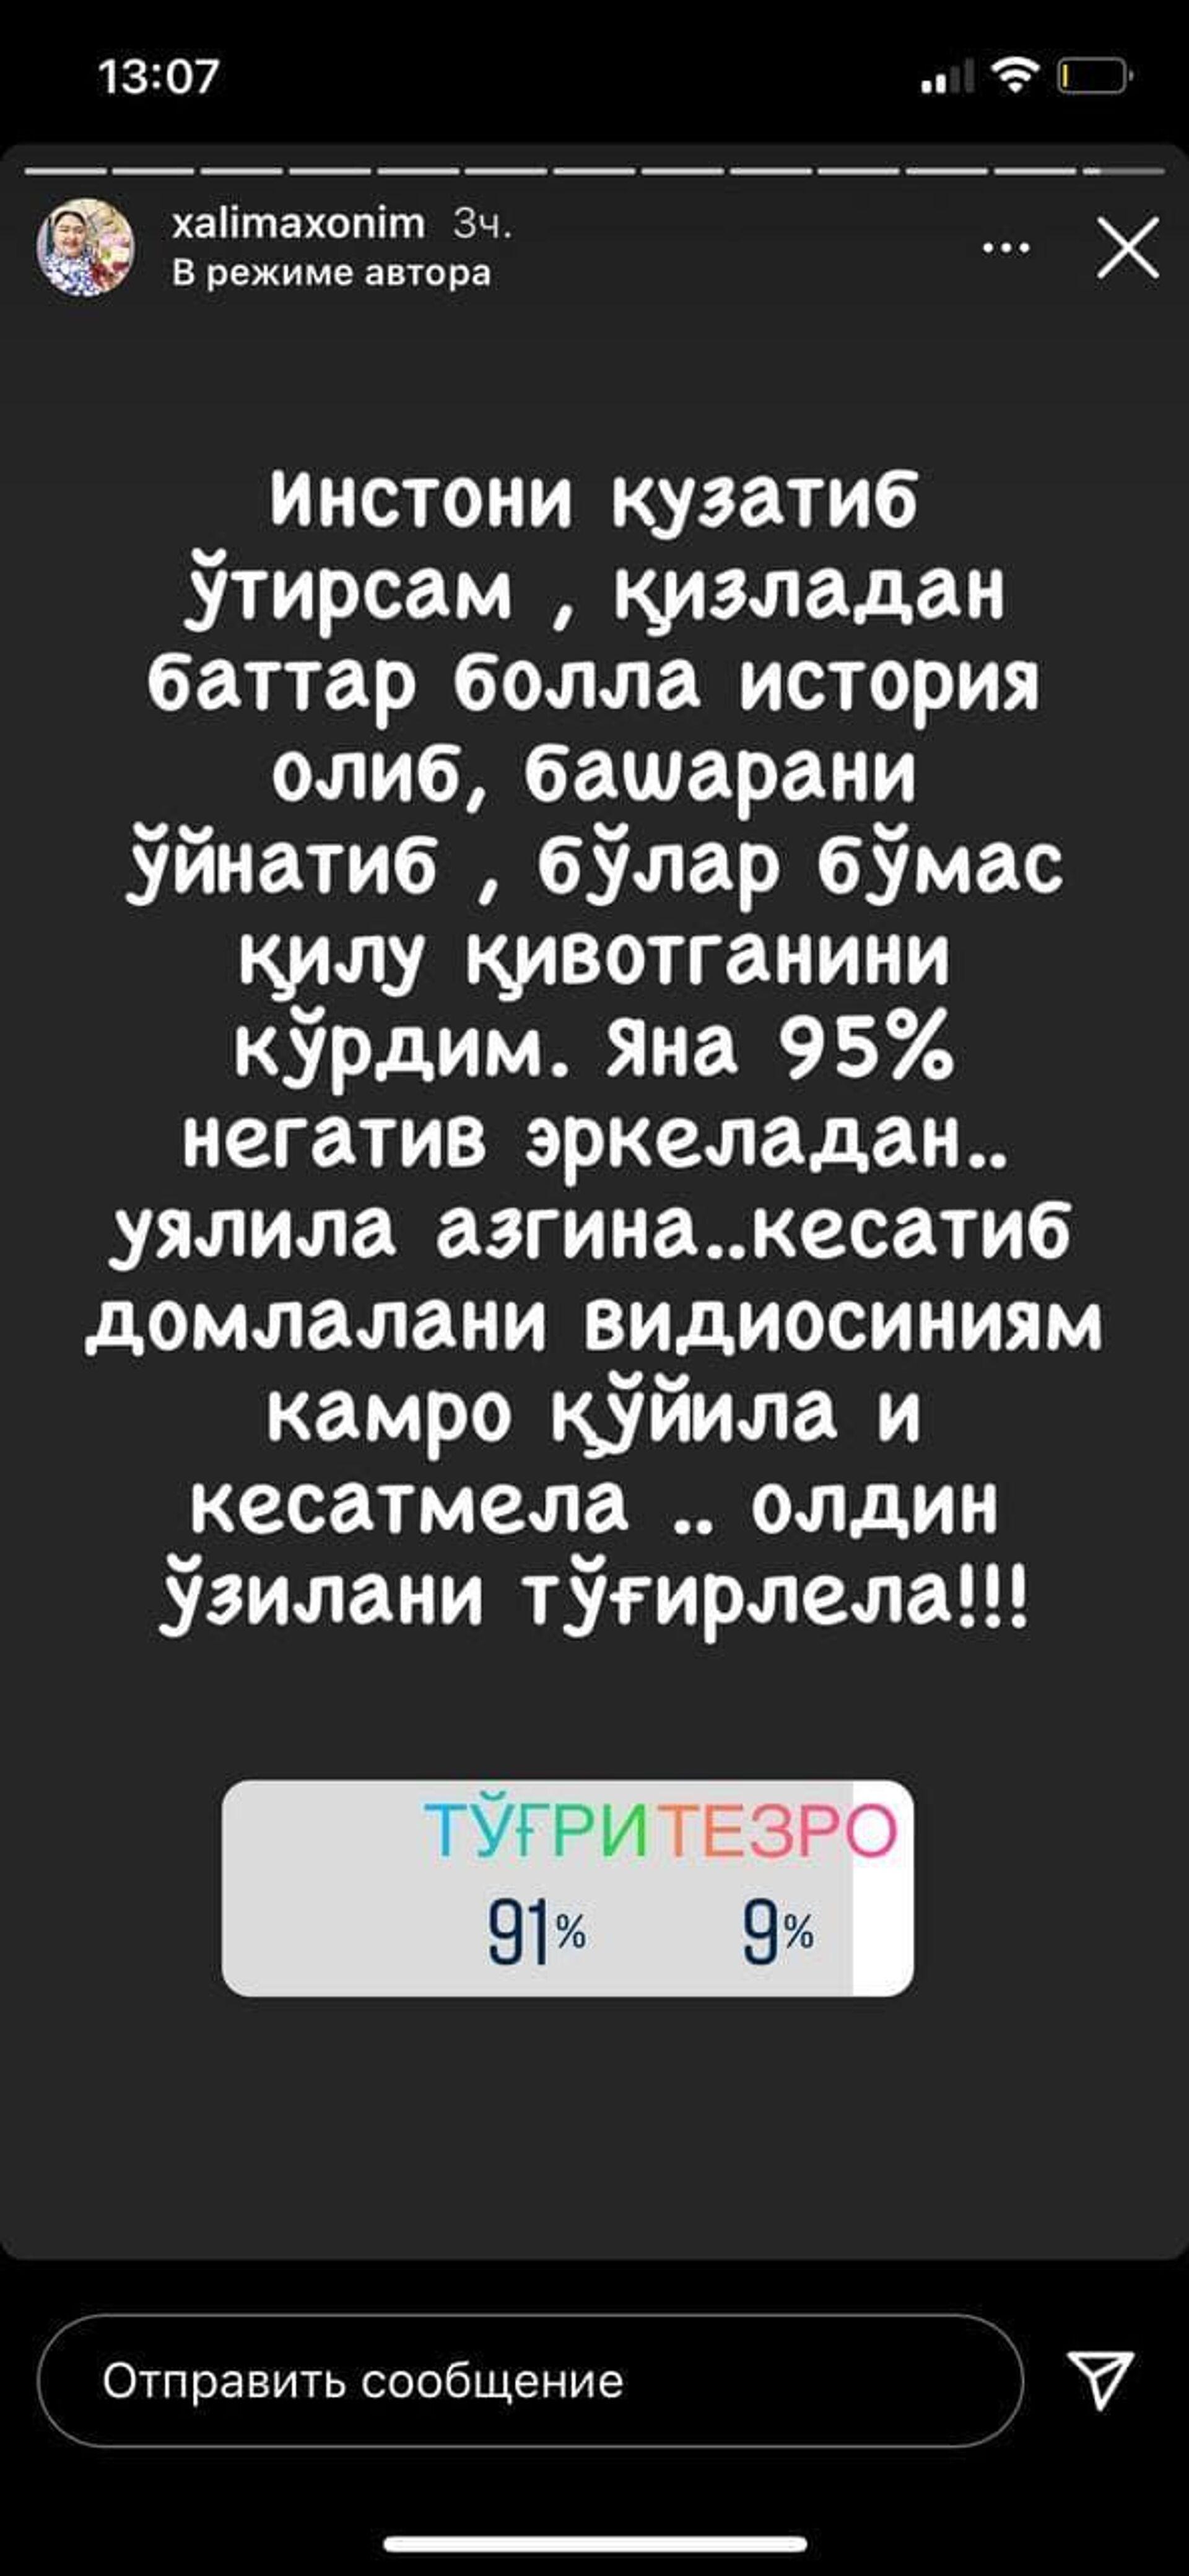 Сторис артистки Халимы Ибрагимовой  - Sputnik Таджикистан, 1920, 13.09.2021